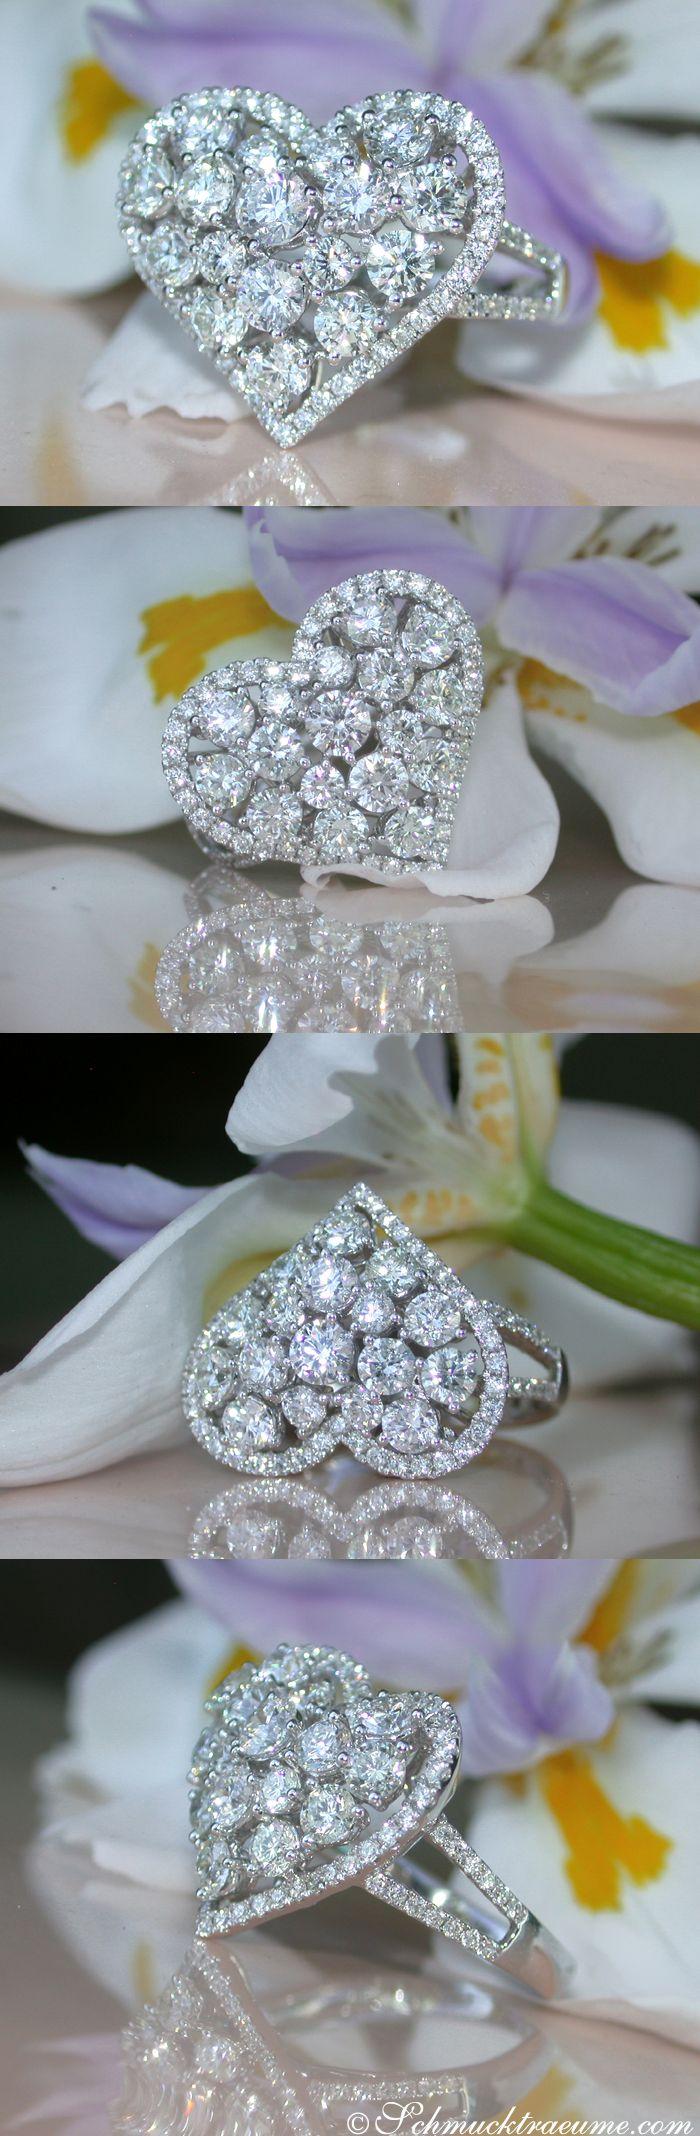 Exquisite Diamond Heart Ring, 2.60 ct. G-VS1 WG18K - Visit: schmucktraeume.com Like: https://www.facebook.com/pages/Noble-Juwelen/150871984924926 Mail: info[at]schmucktraeume.com